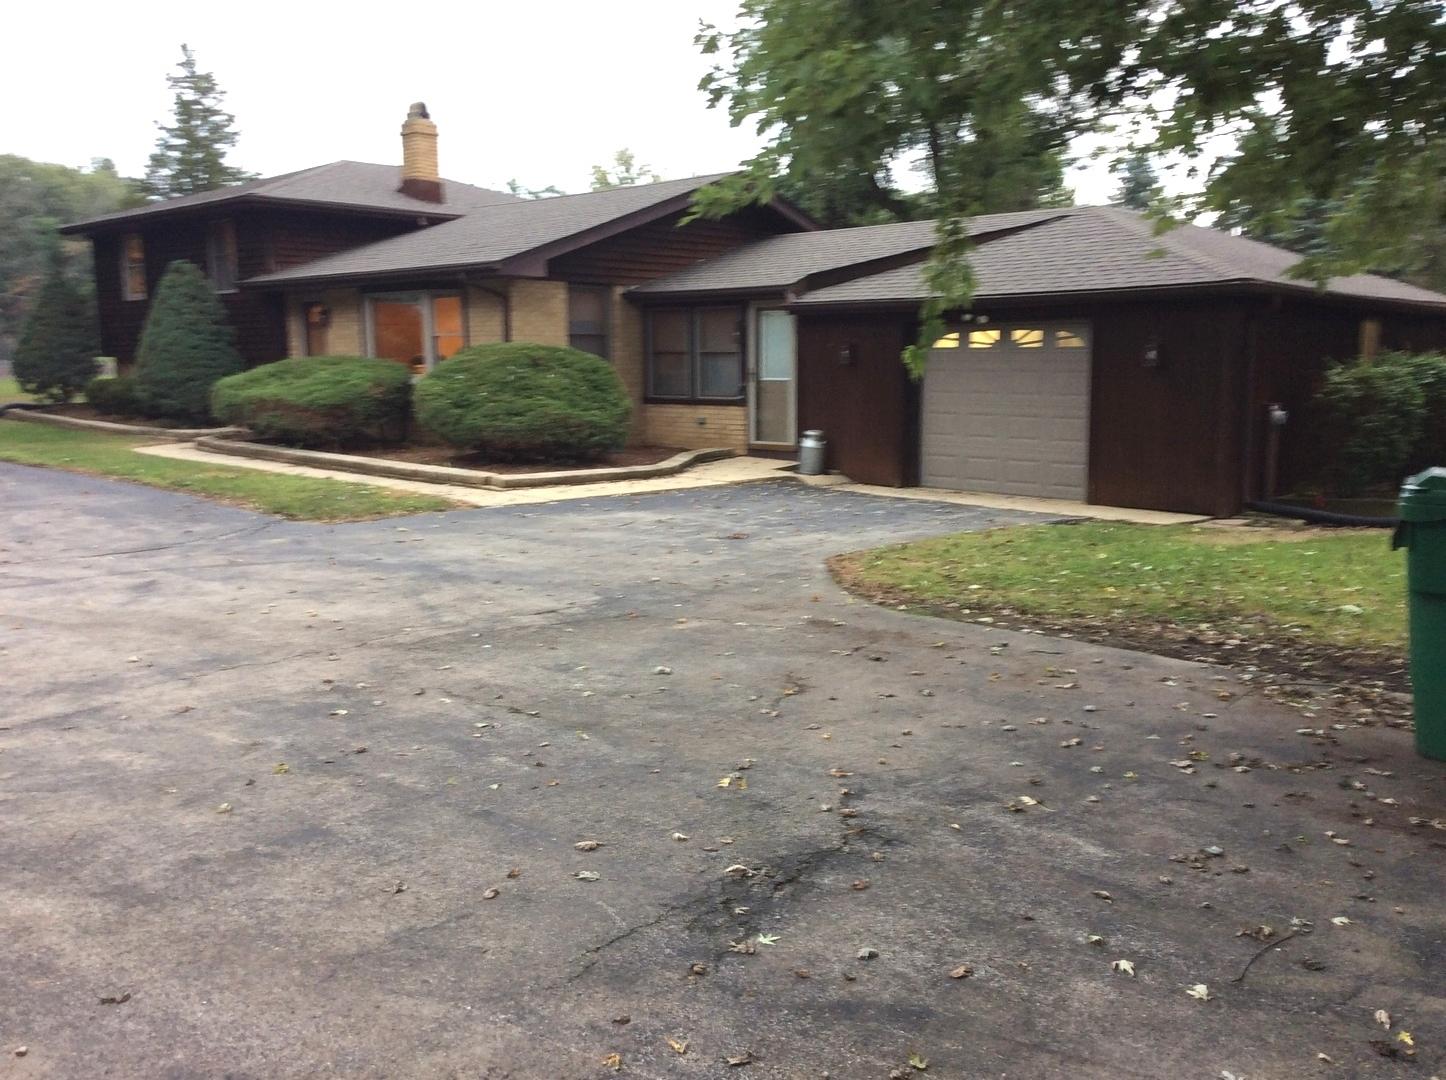 15054 147th, Homer Glen, Illinois, 60491